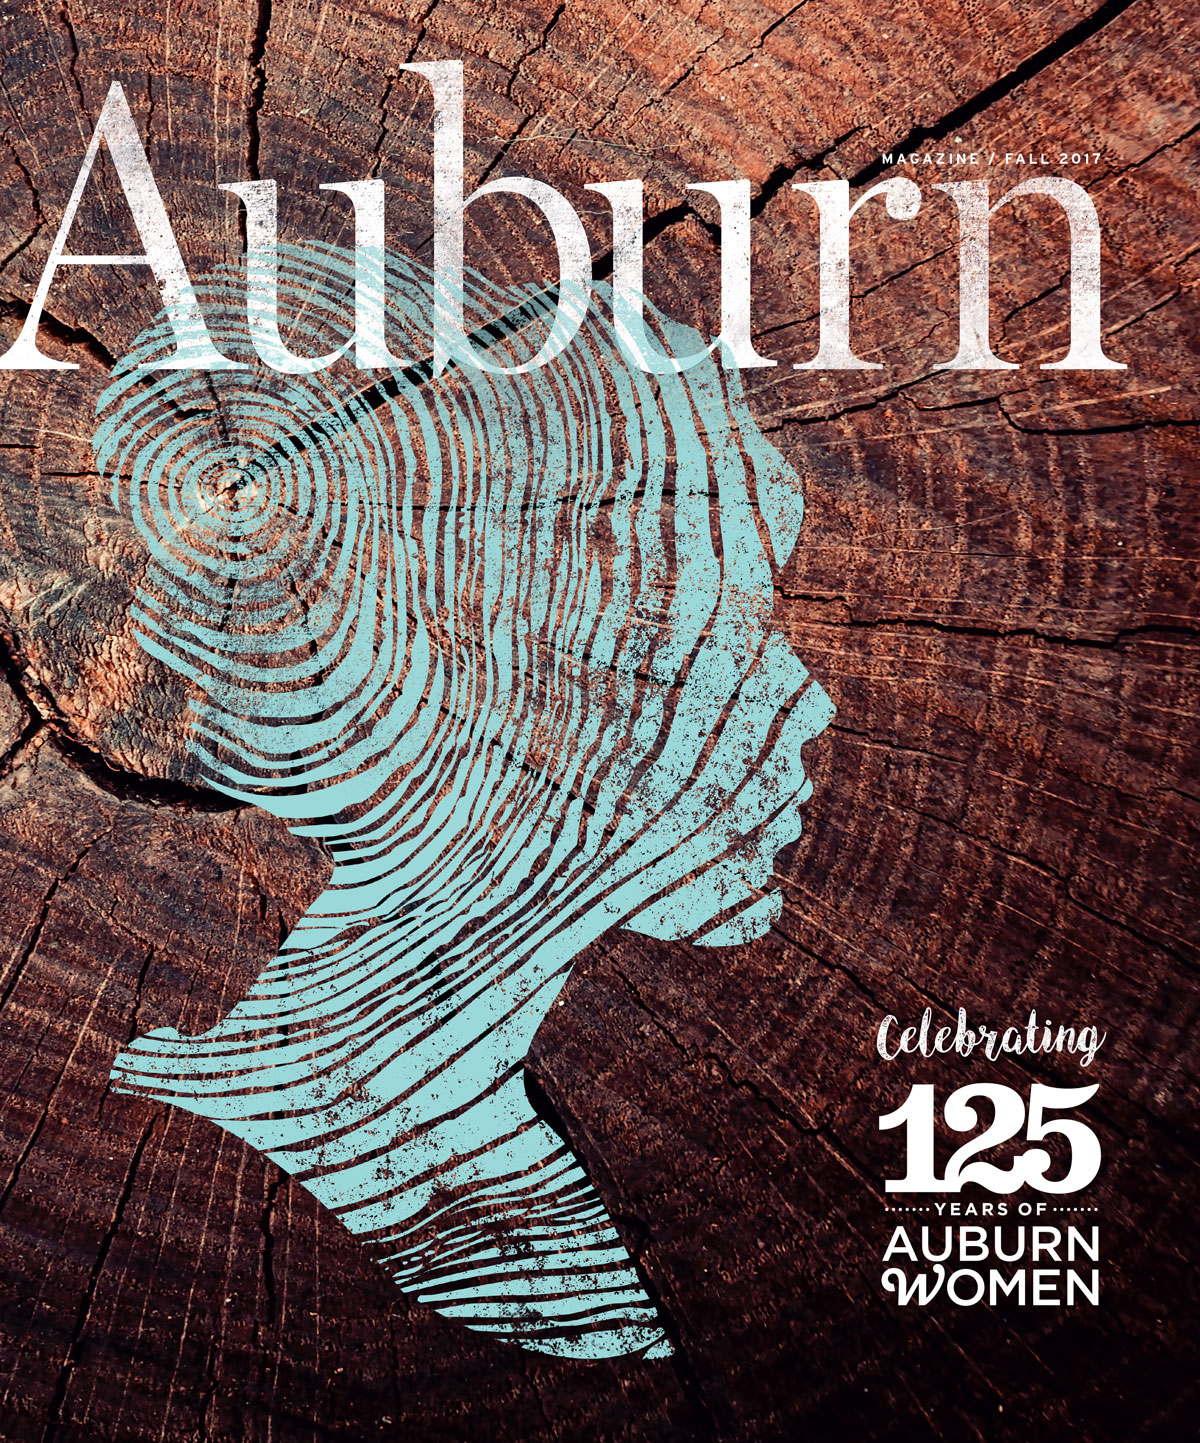 Auburn Mag Fall 2017 Cover